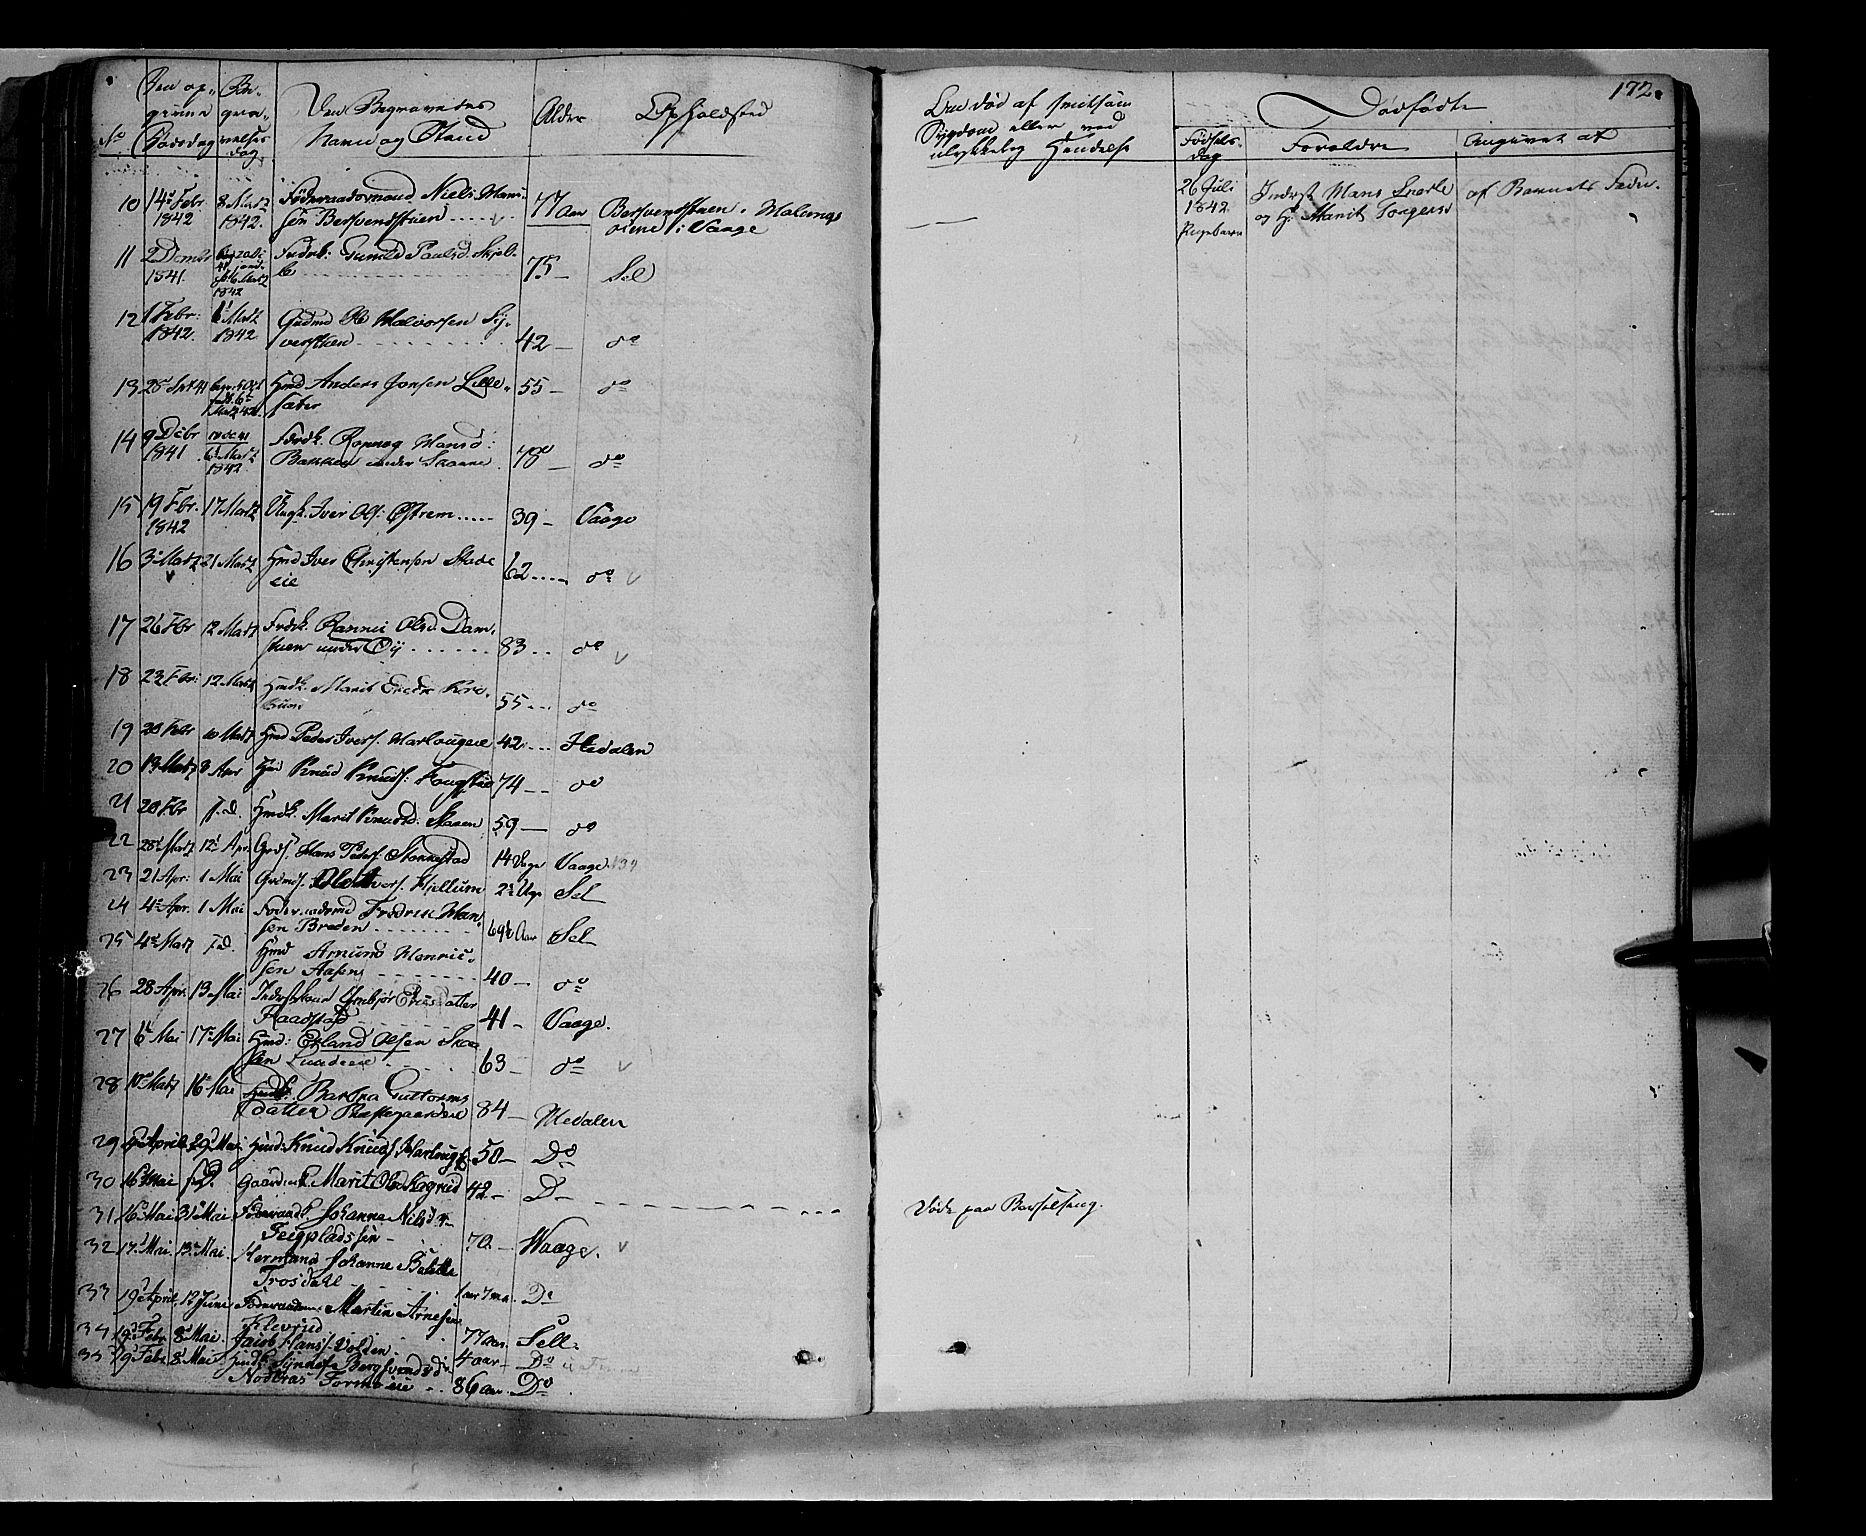 SAH, Vågå prestekontor, Ministerialbok nr. 5 /1, 1842-1856, s. 172